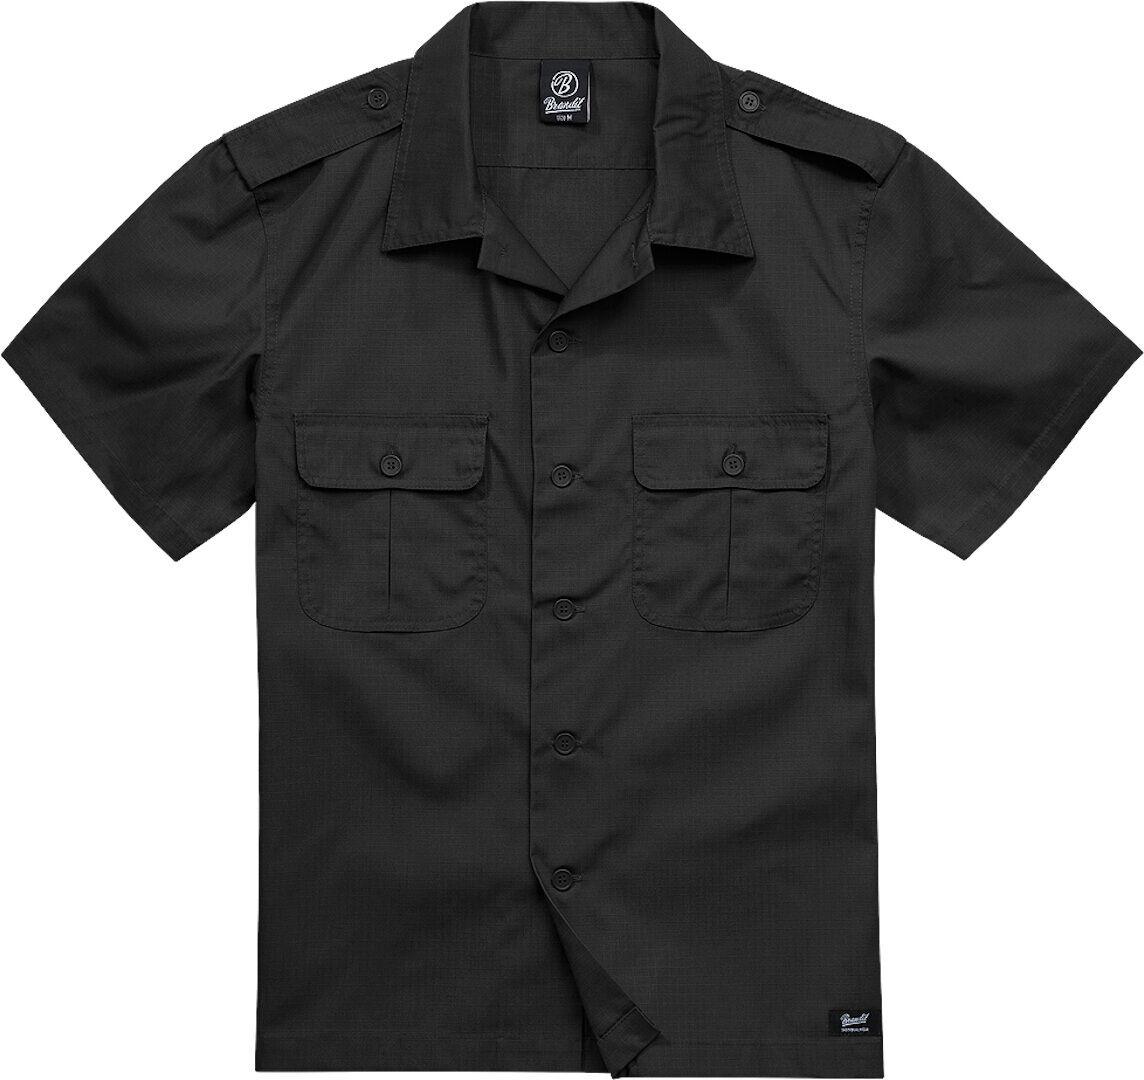 Brandit US Ripstop Paita  - Musta - Size: M